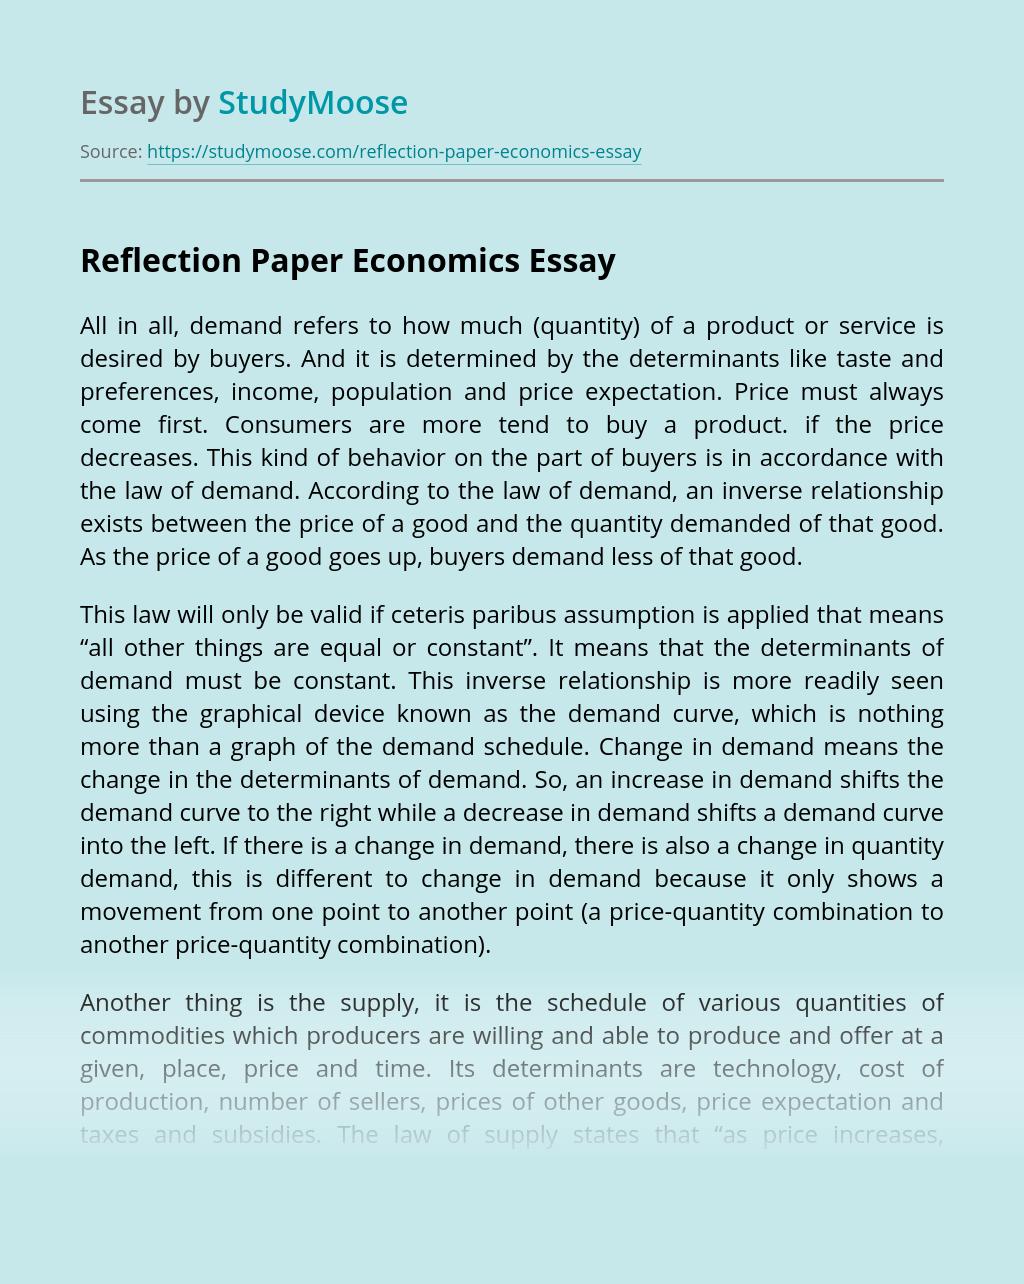 Reflection Paper Economics